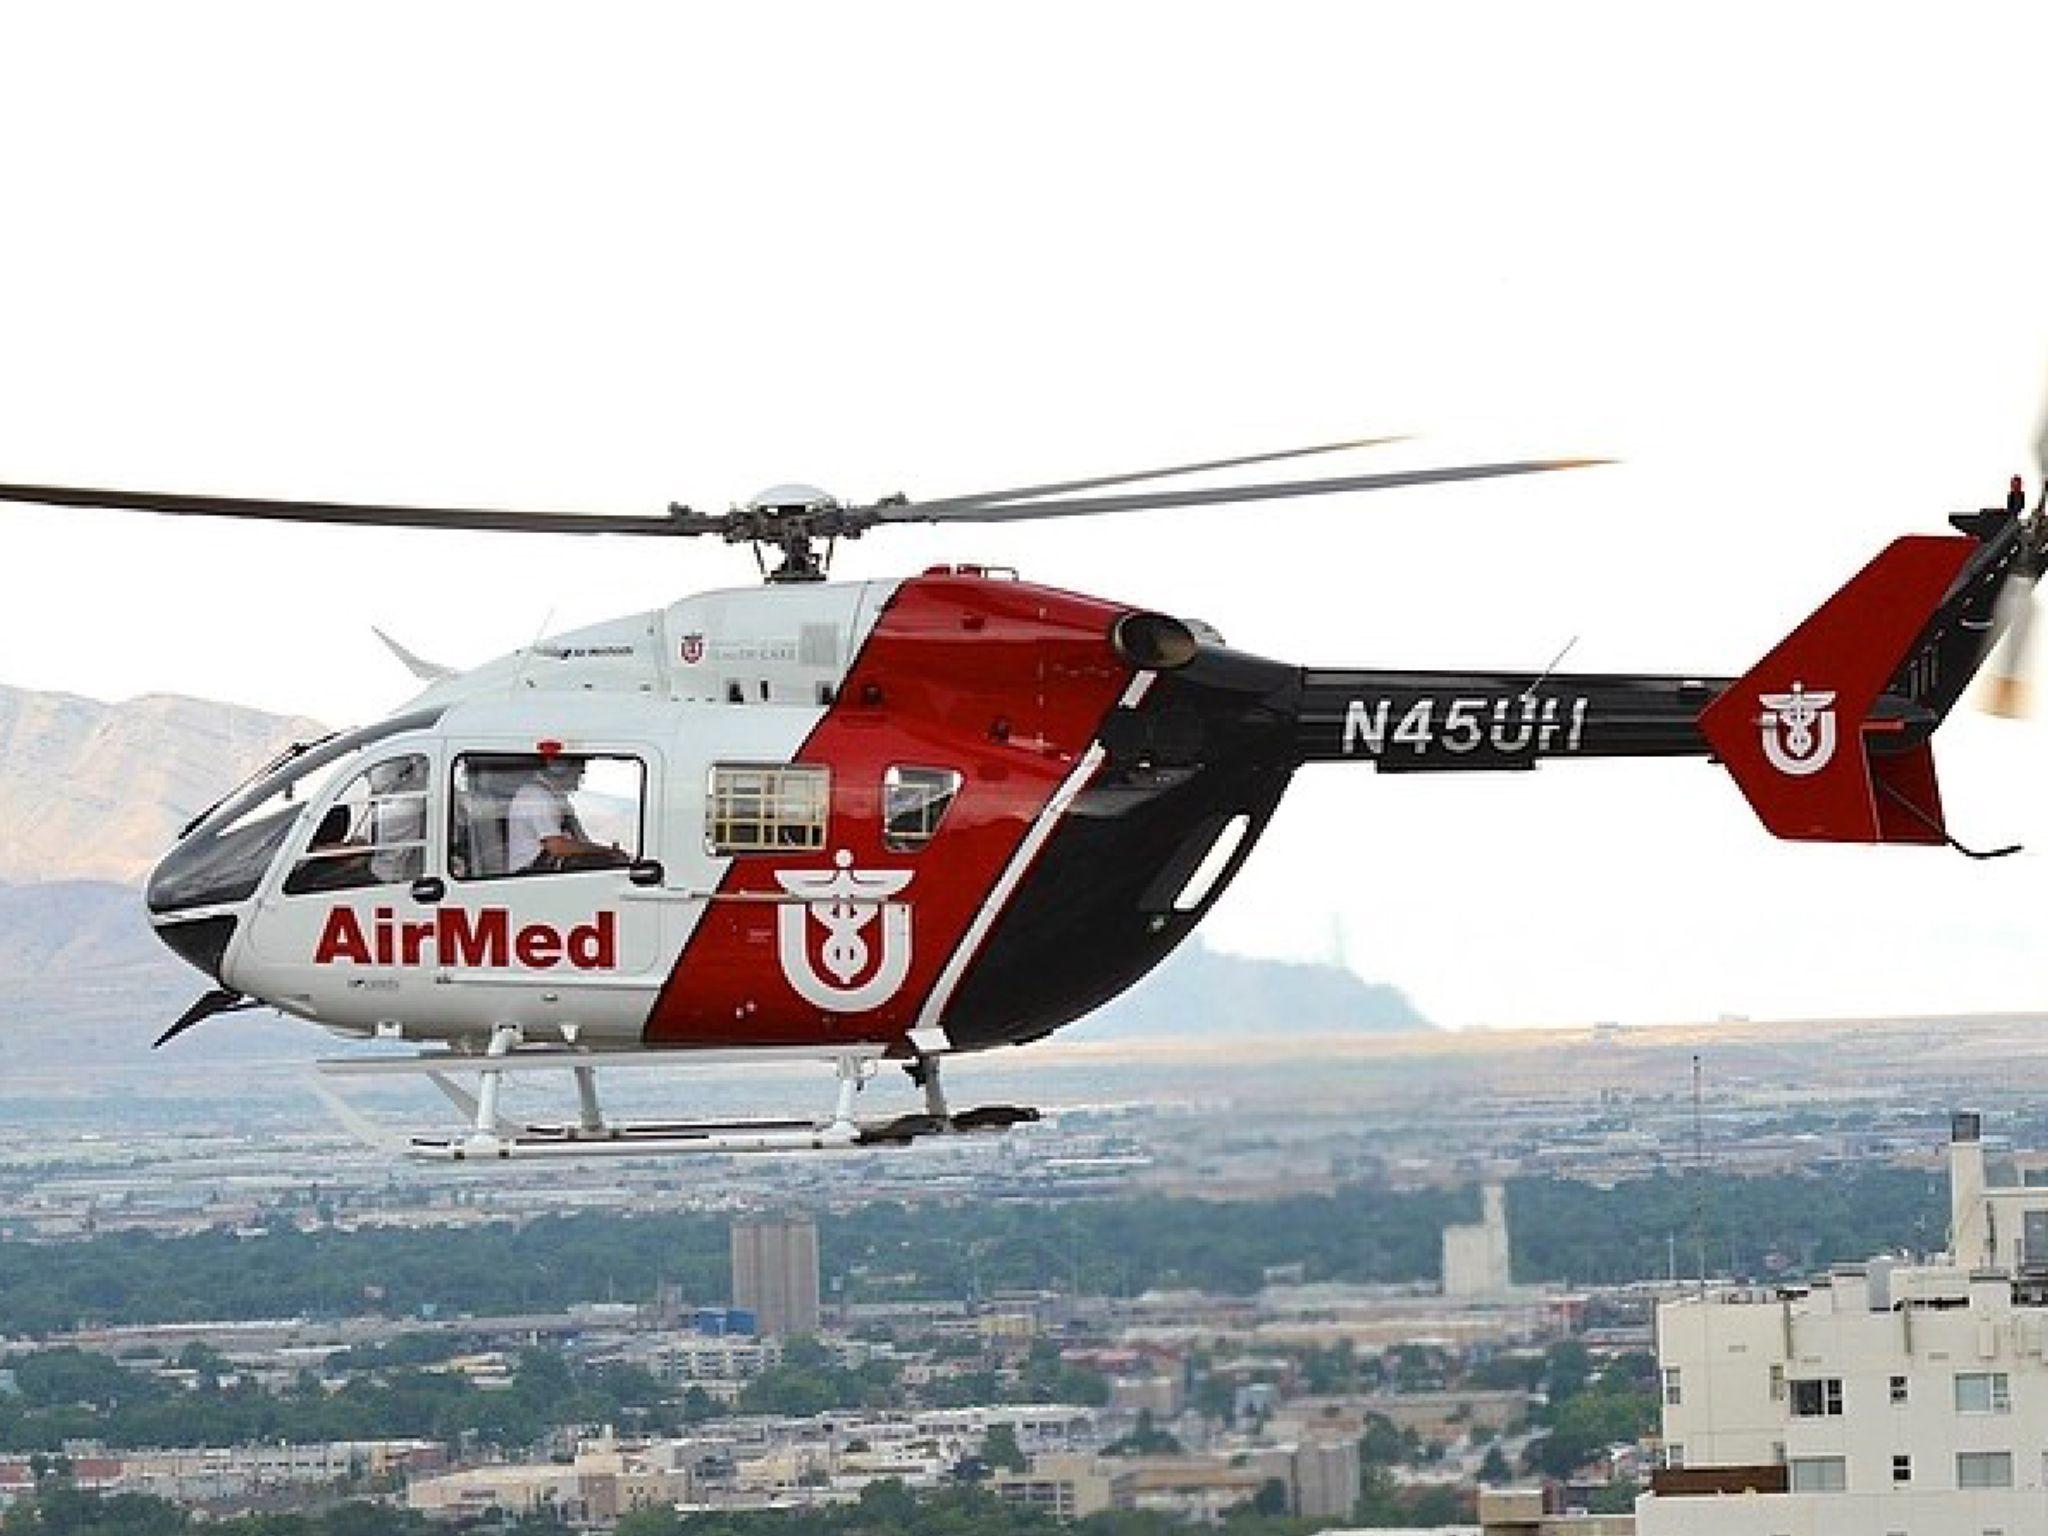 University Of Utah Air Med Life Flight Helicopter Helicopter Flight Paramedic